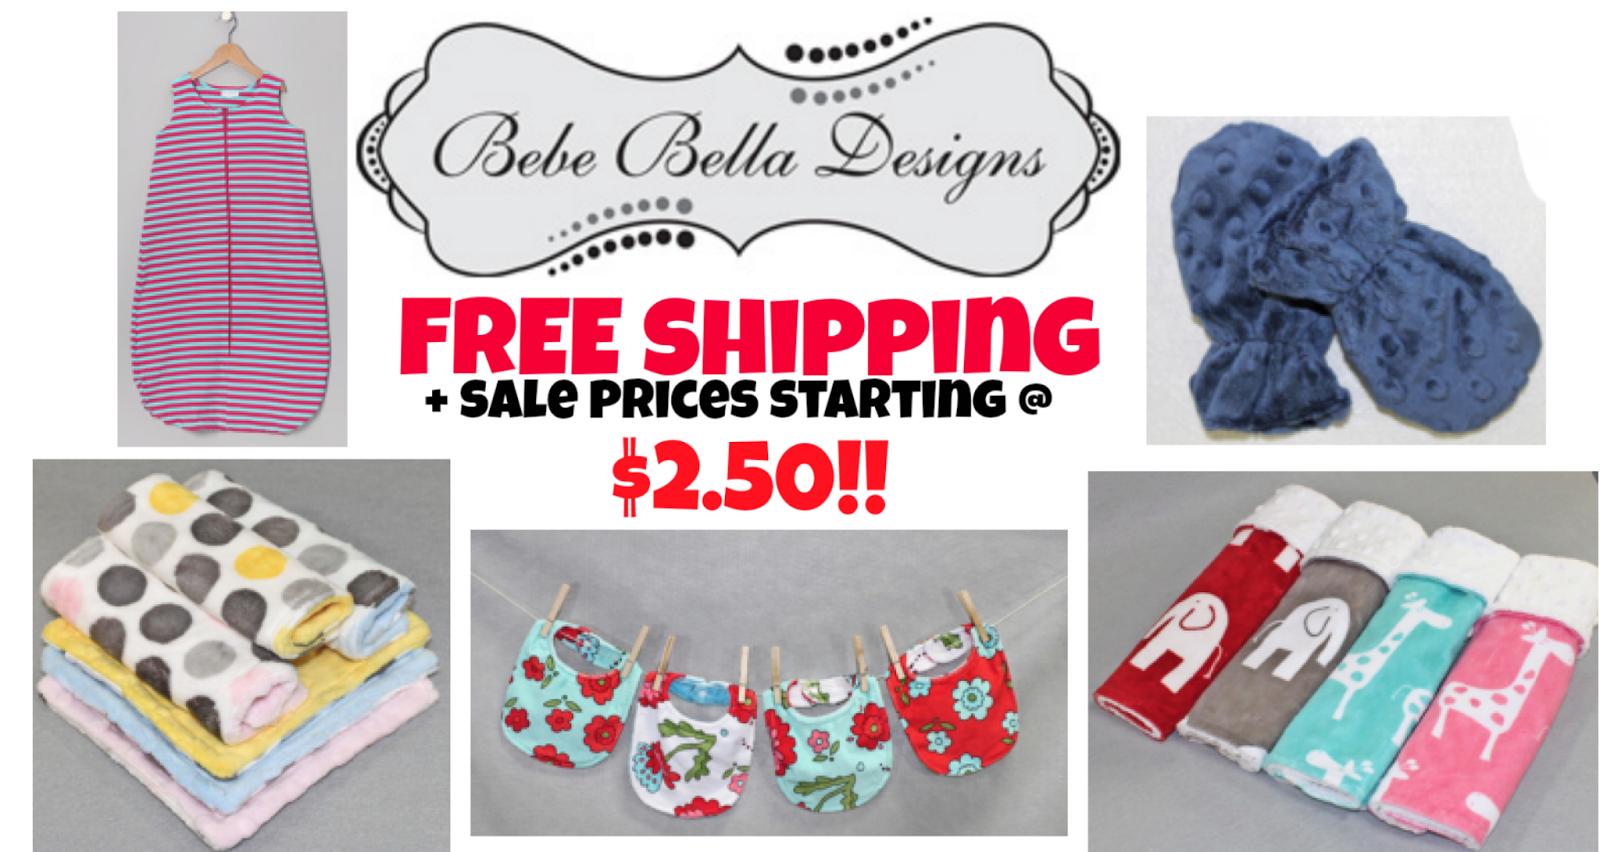 http://www.thebinderladies.com/2015/02/bebebelladesigns-free-shipping-on-any.html#.VO--SkLduyM